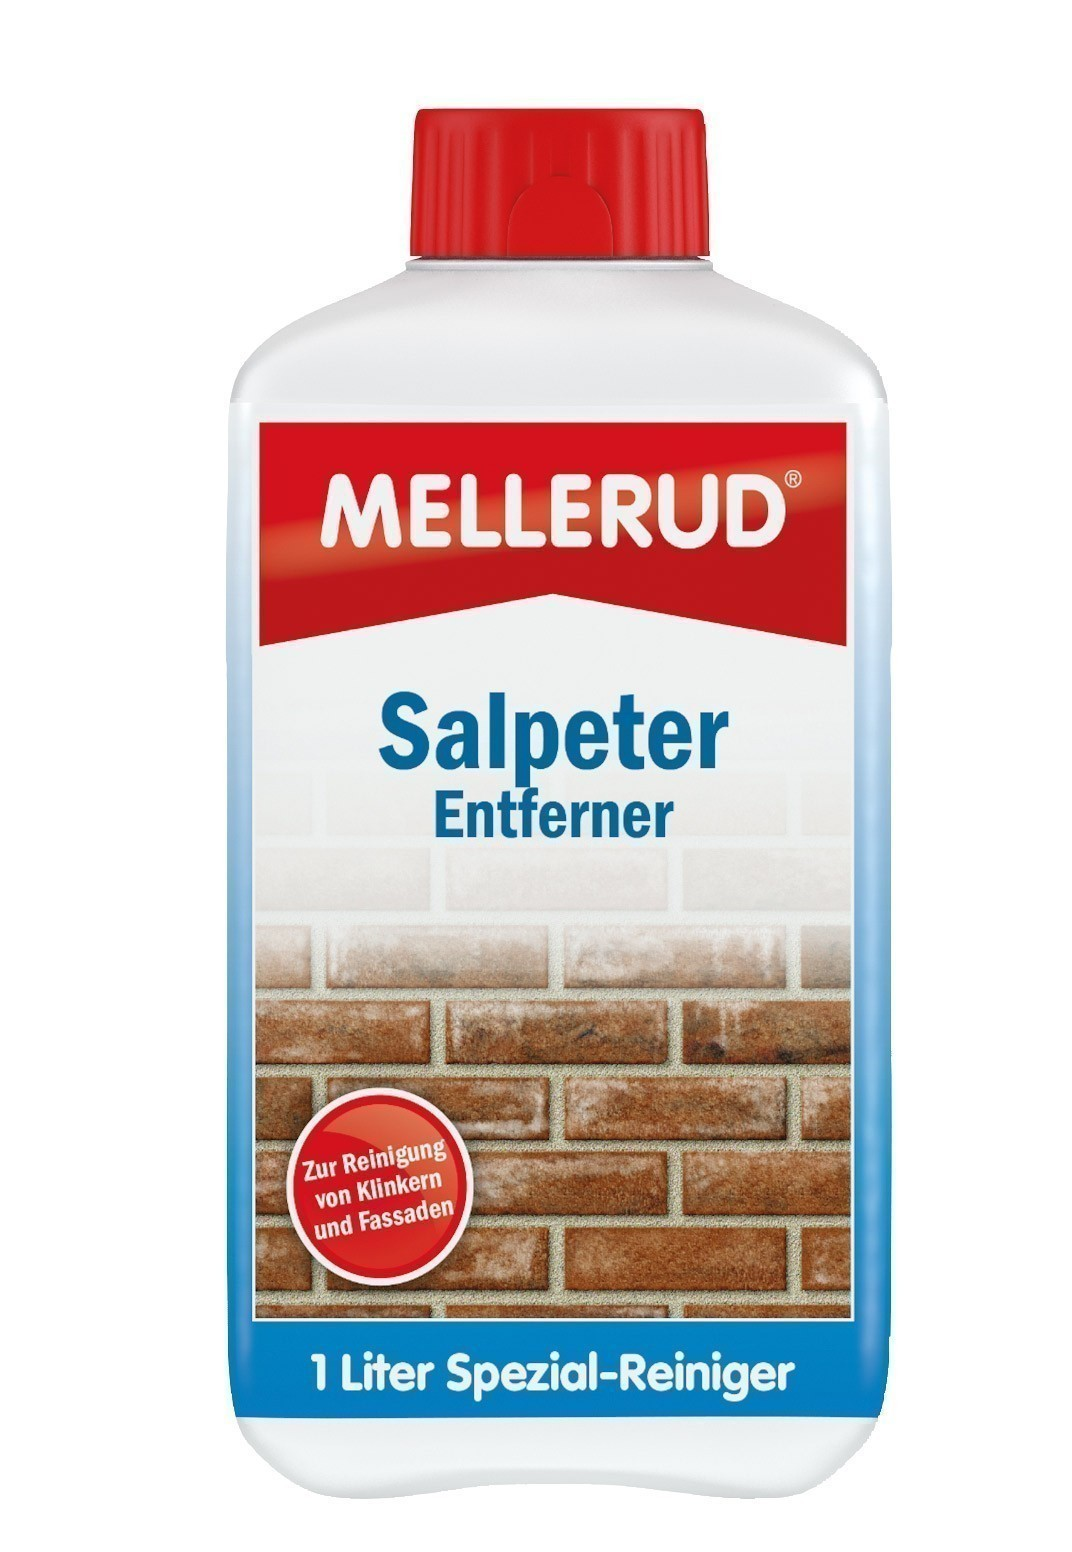 MELLERUD Salpeter Entferner 1,0 Liter Bild 1